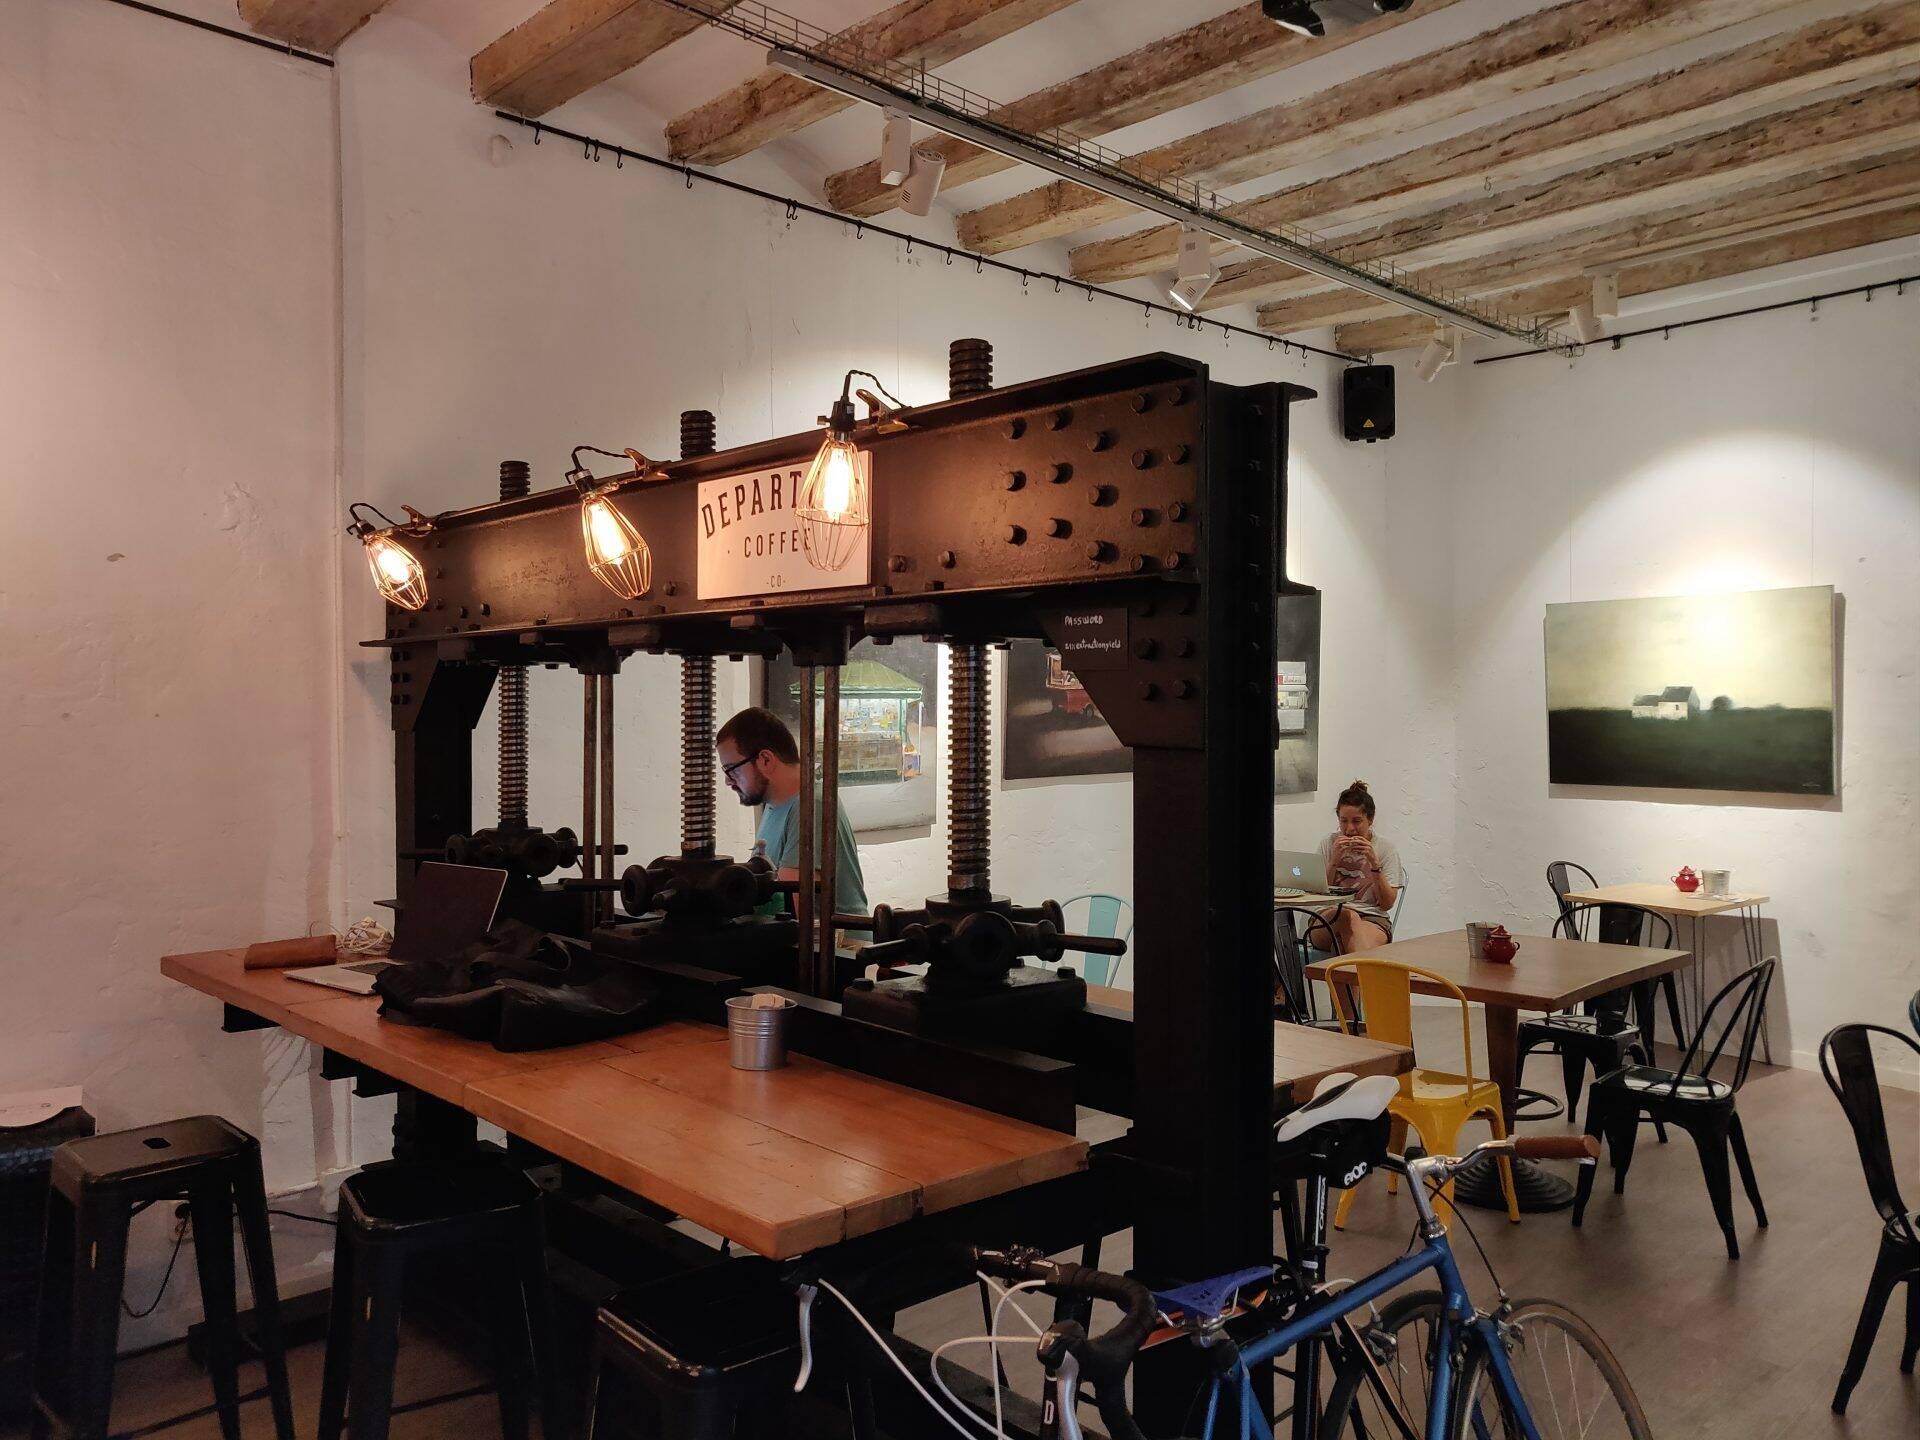 Departure Coffee Co. in Barcelona